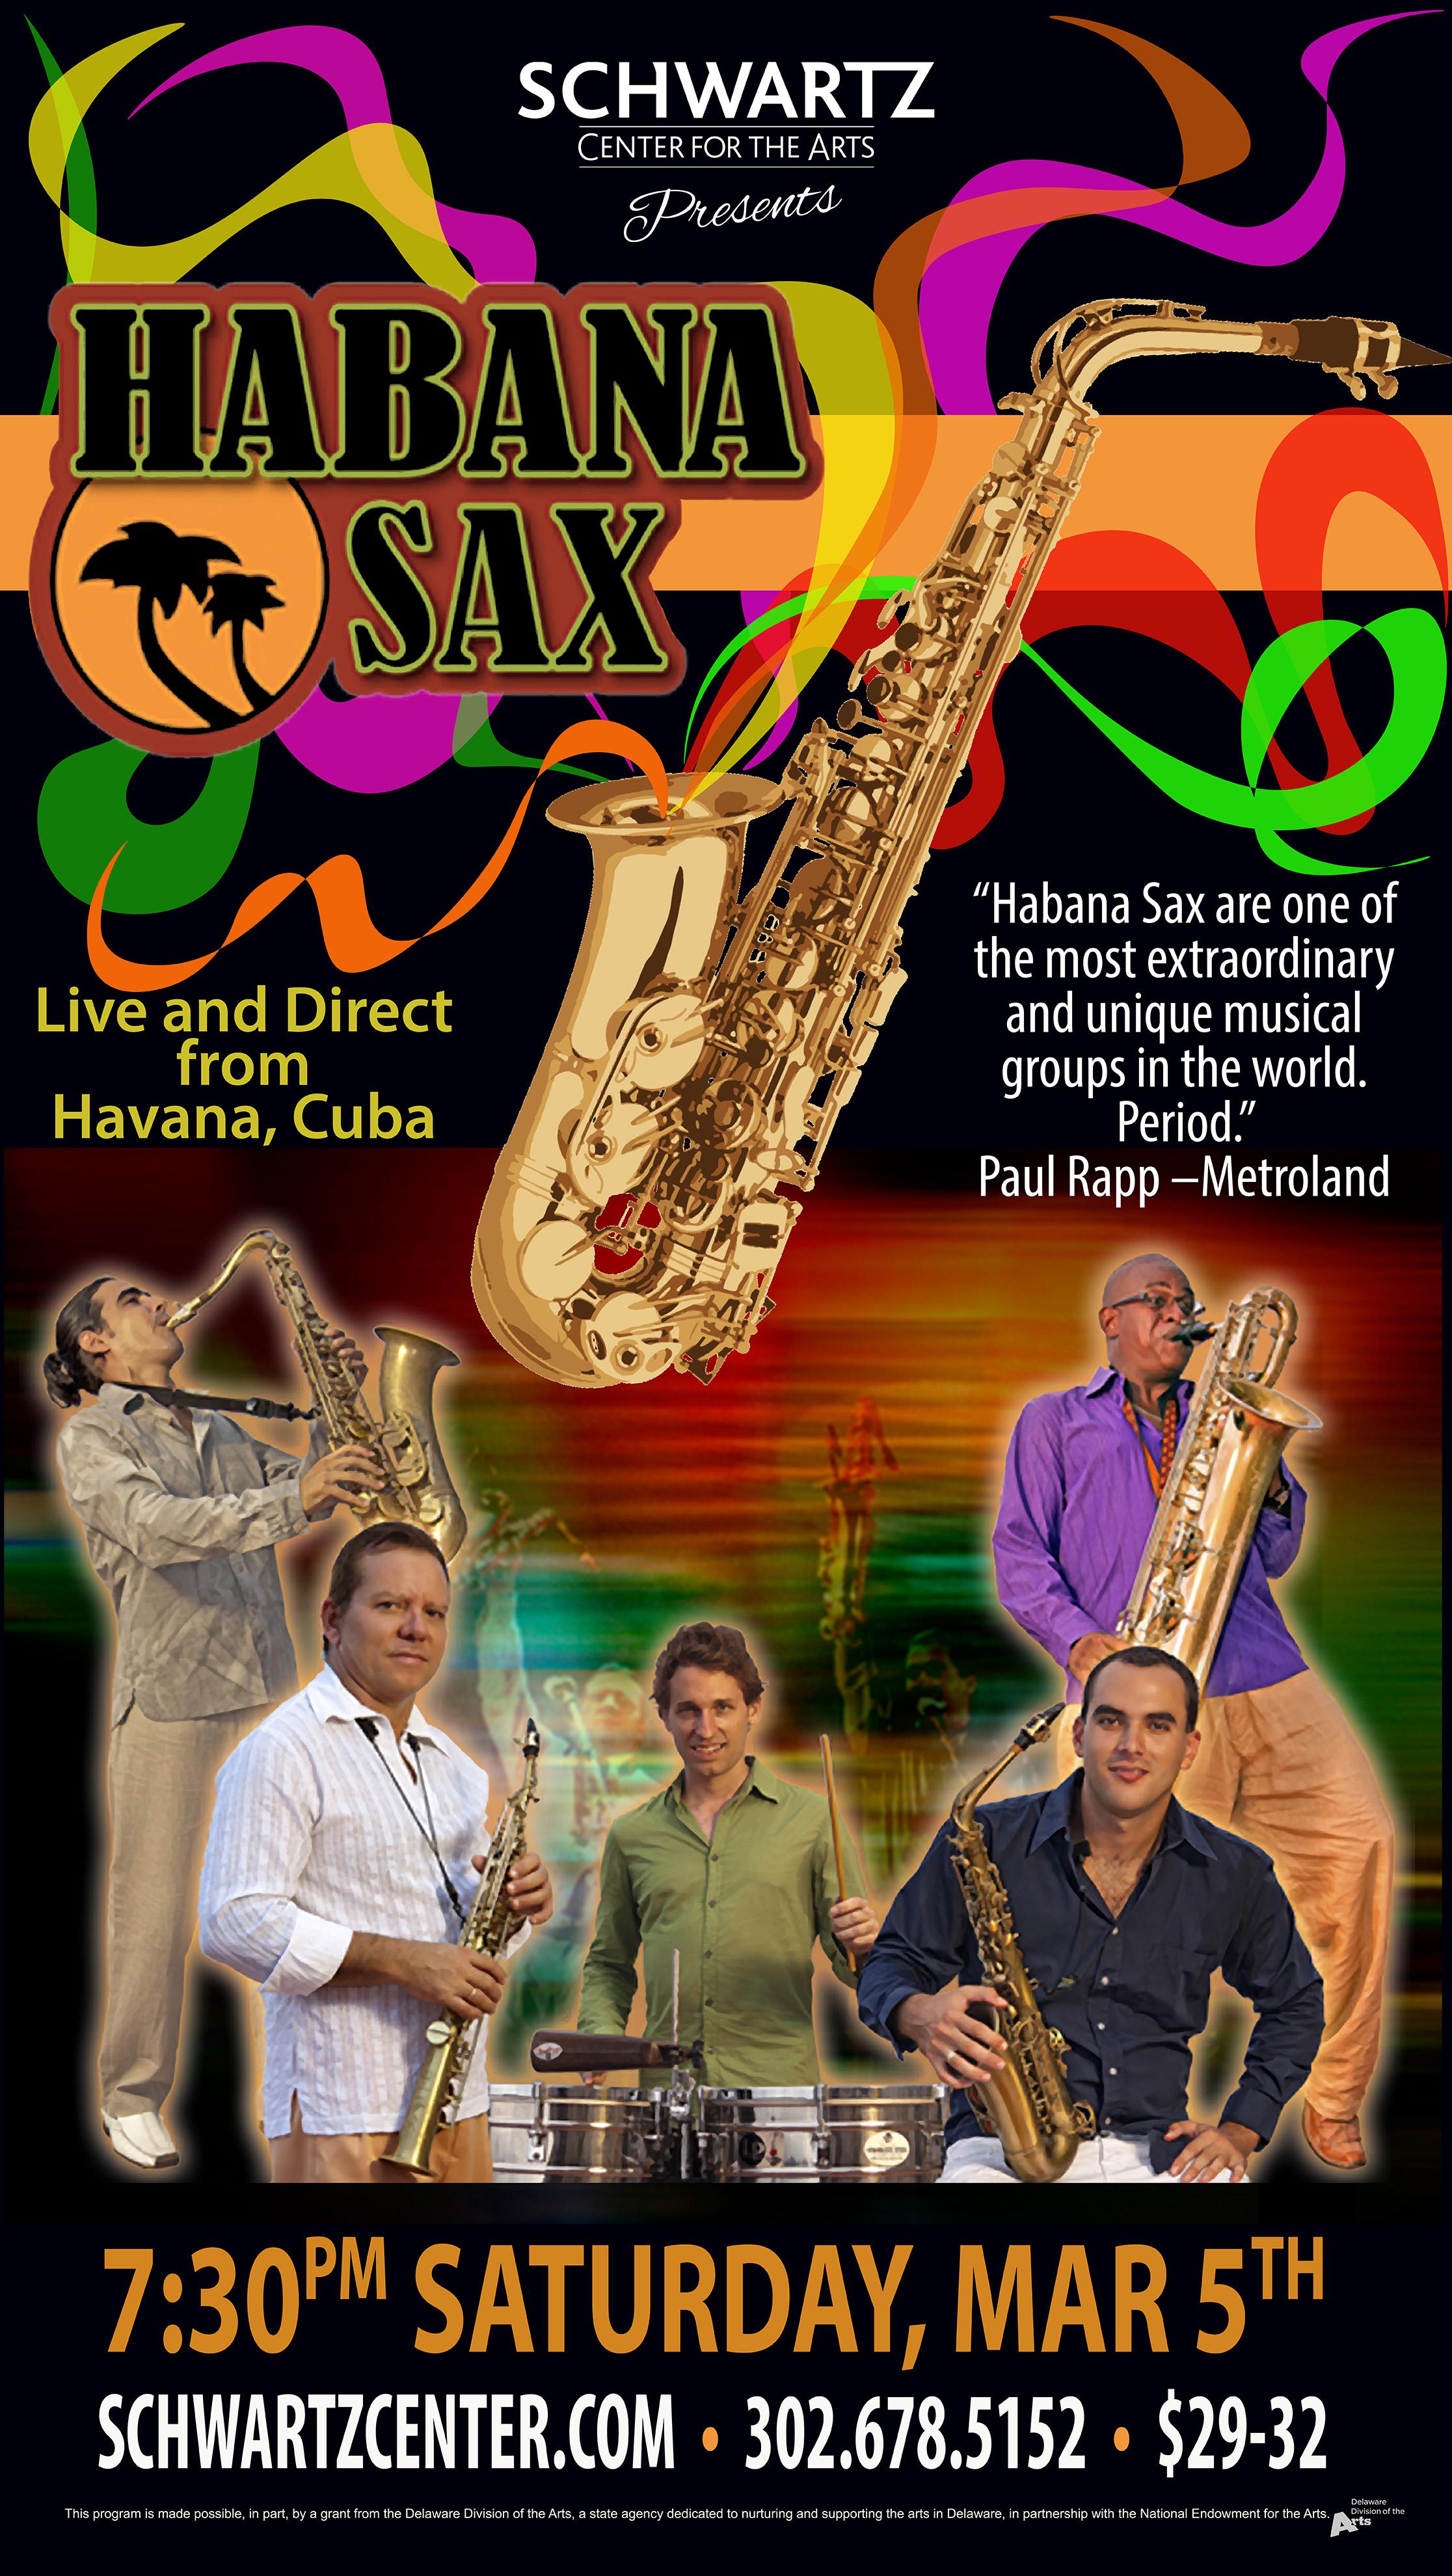 Concert Poster - Habana Sax